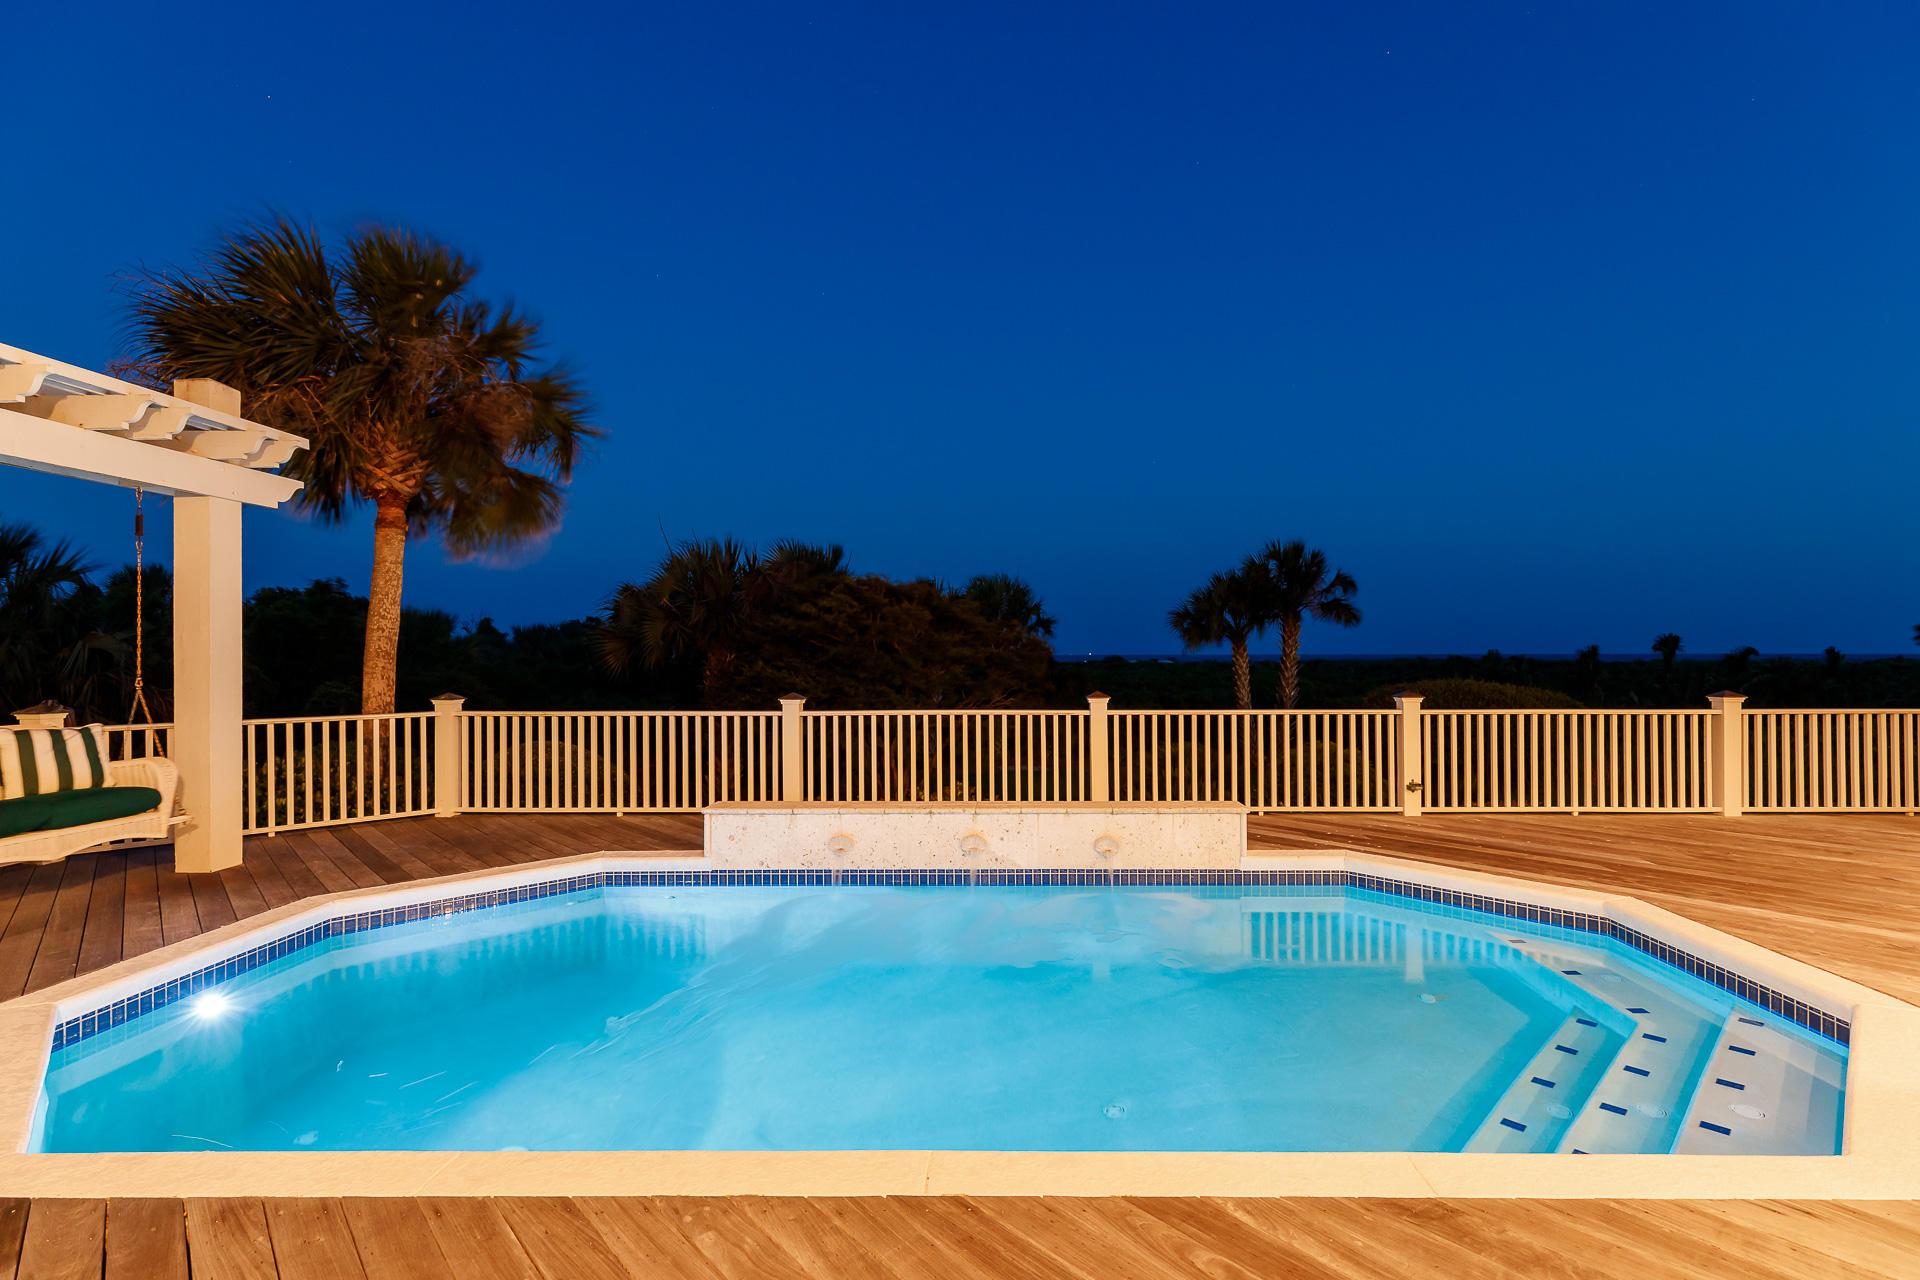 Seabrook Island Homes For Sale - 2216 Rolling Dune, Seabrook Island, SC - 60